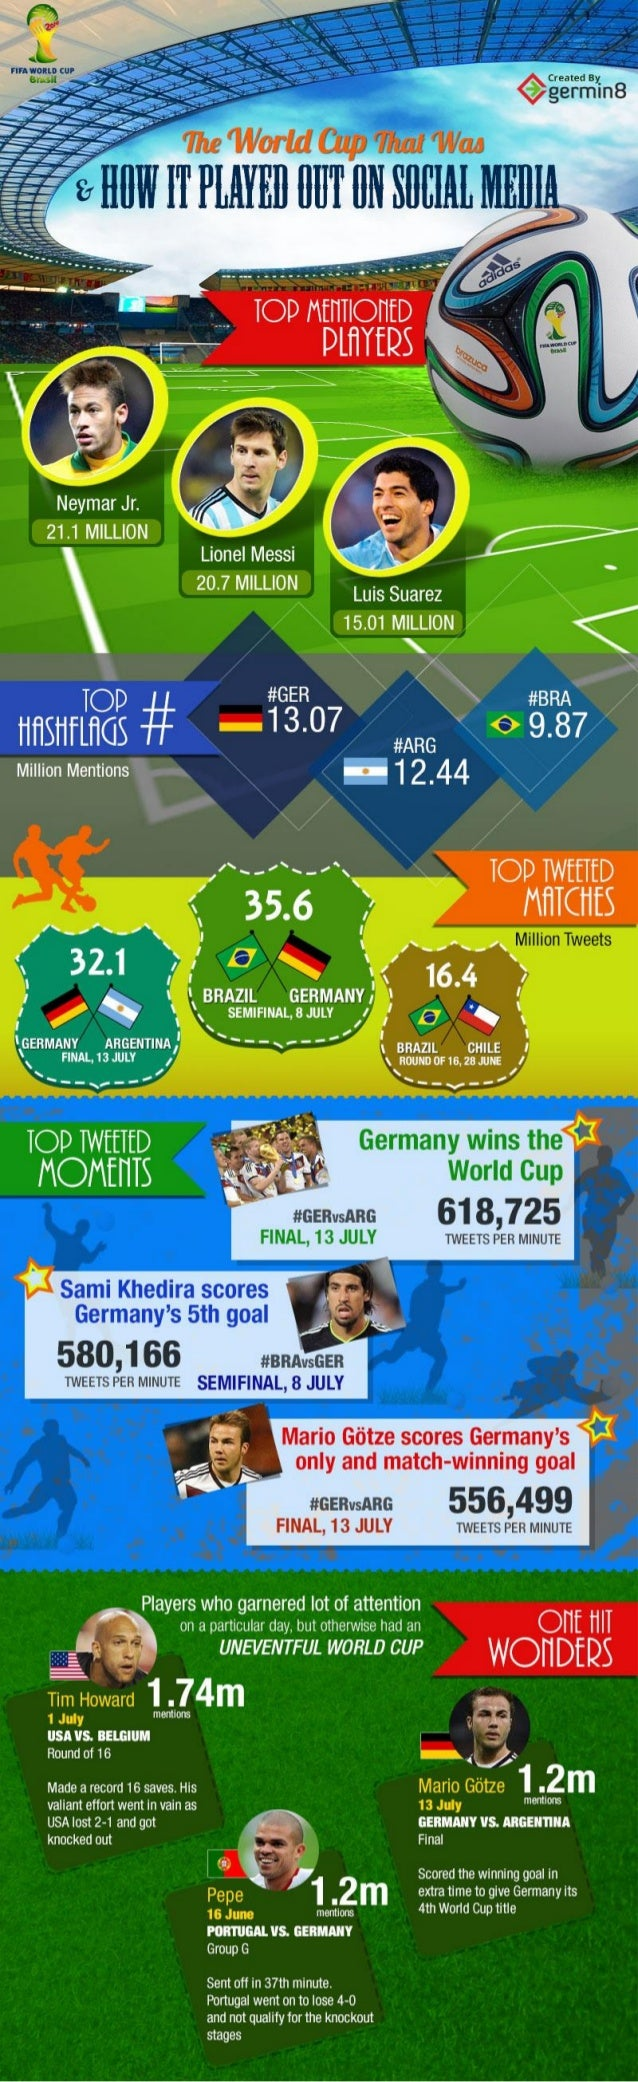 FIFA World Cup 2014: A Social Media Analysis